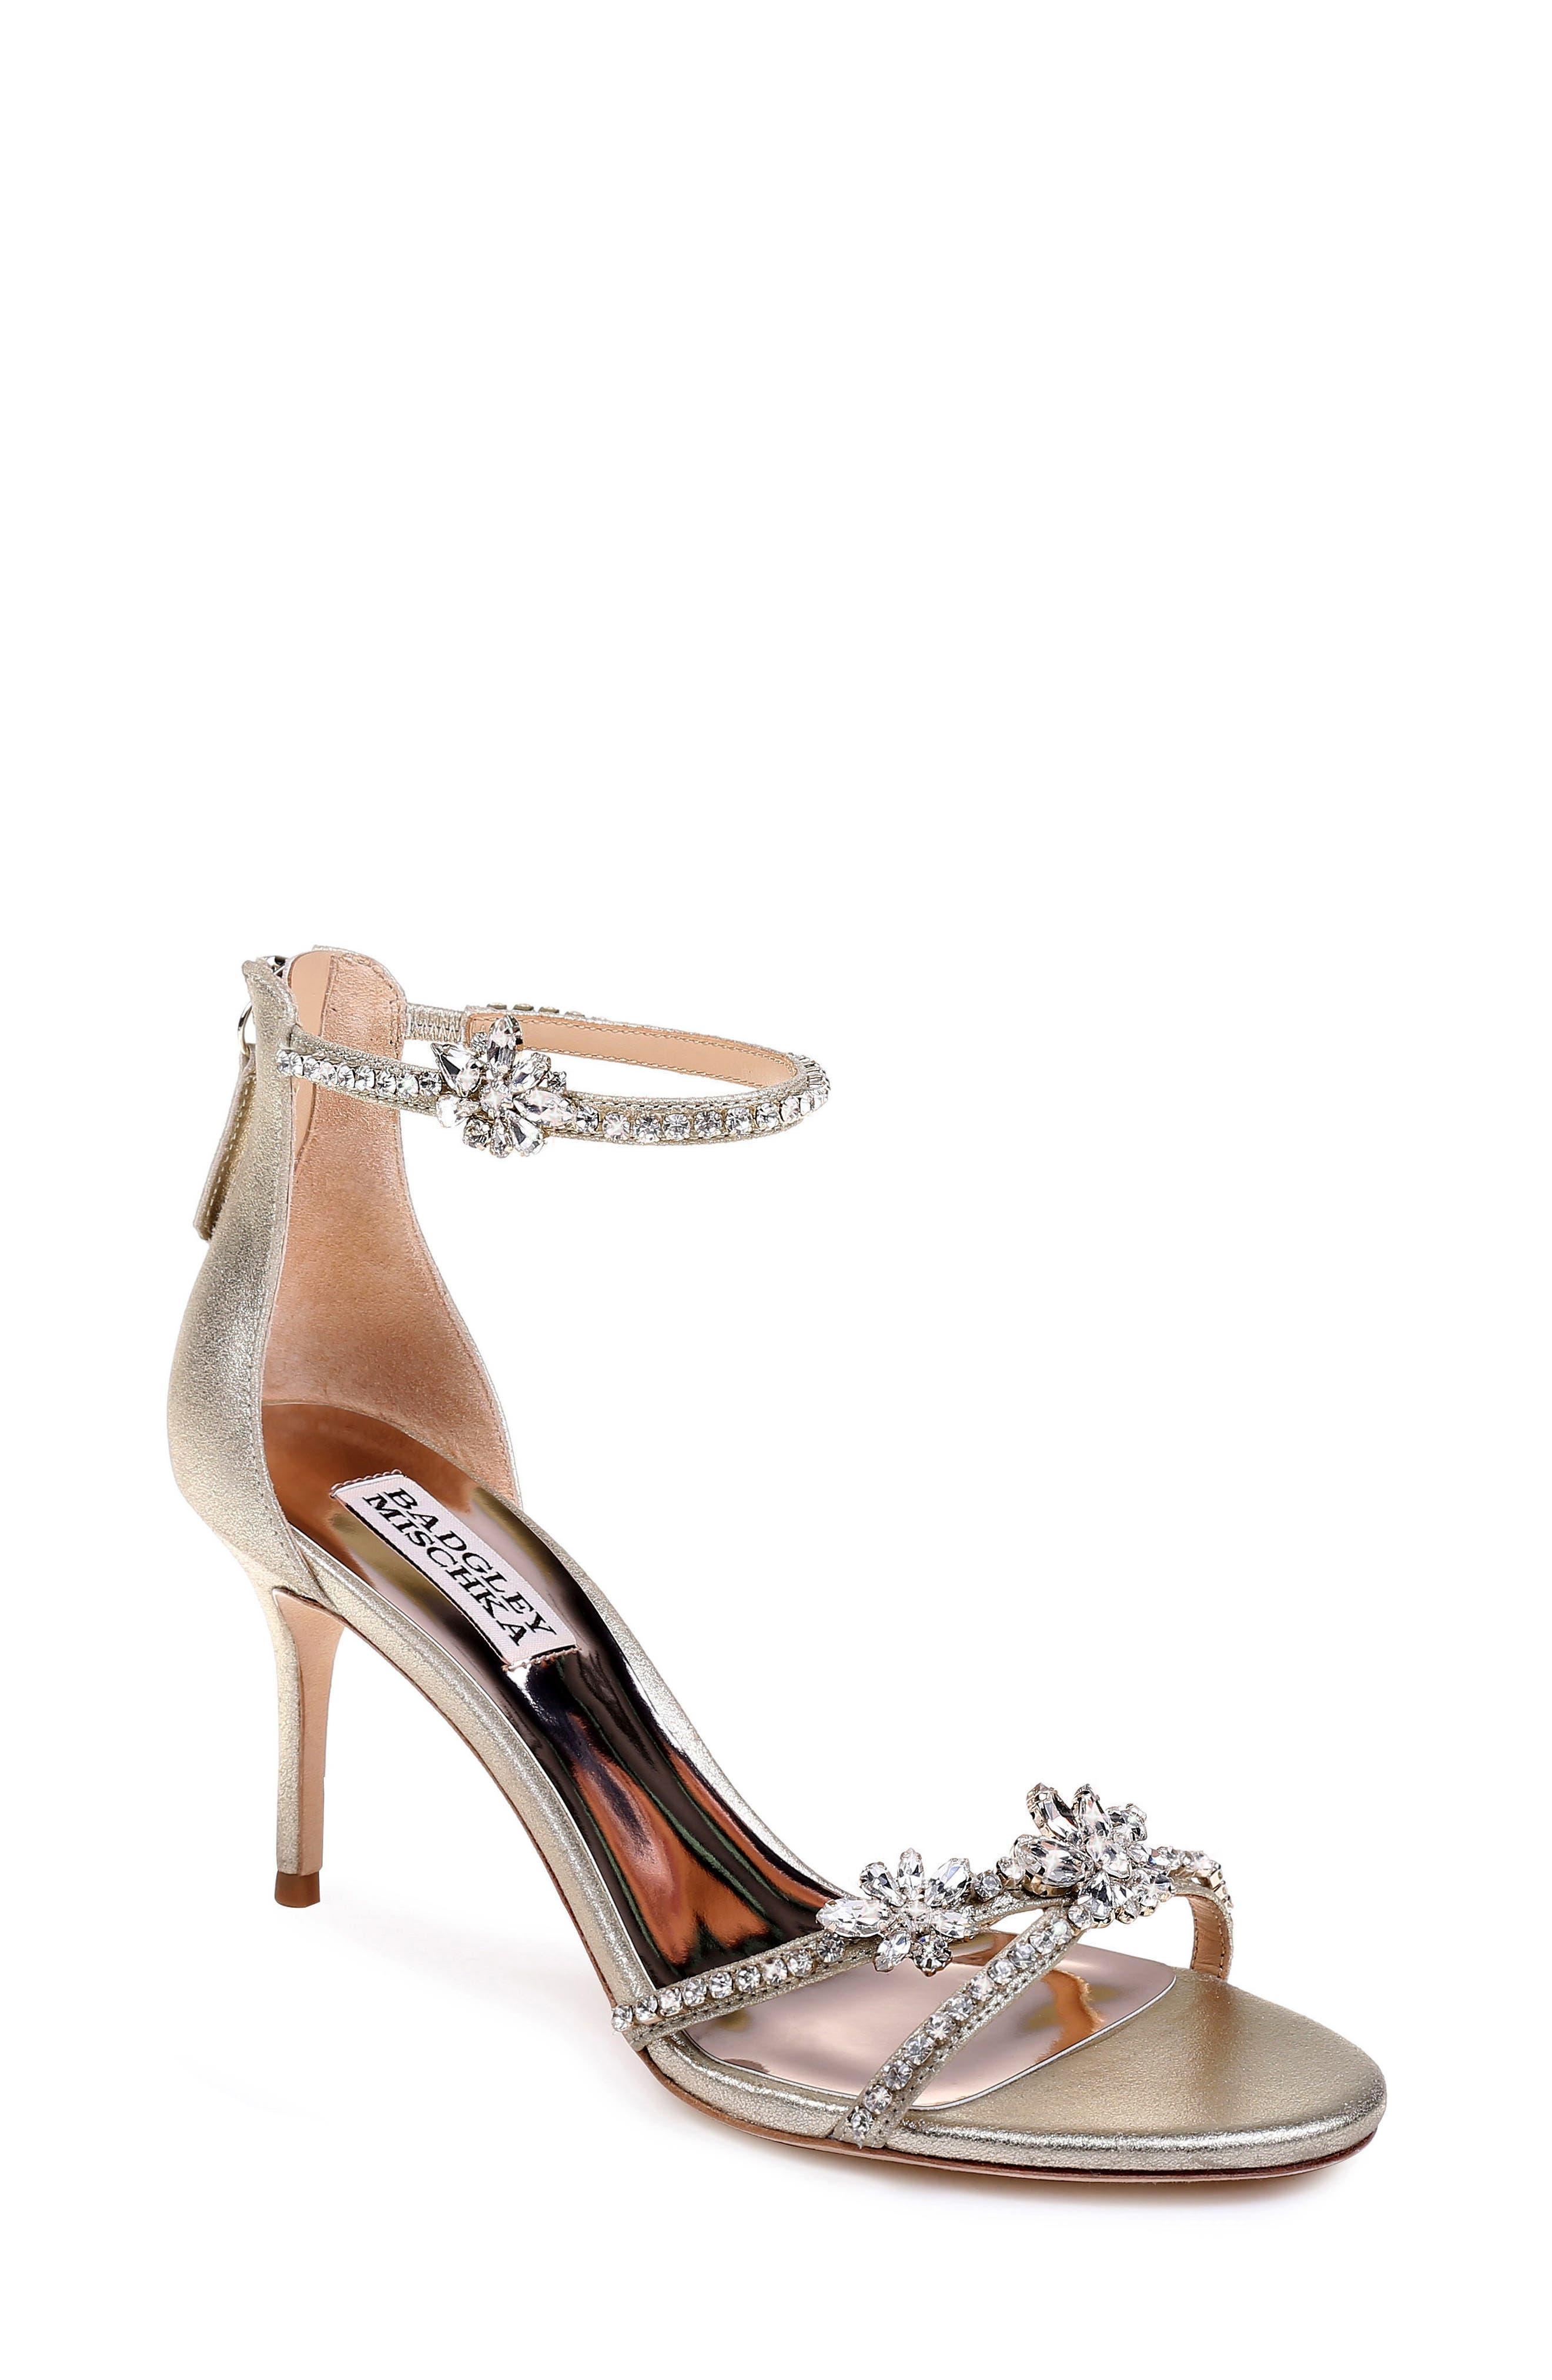 Badgley Mischka Hobbs Ankle Strap Sandal, Metallic